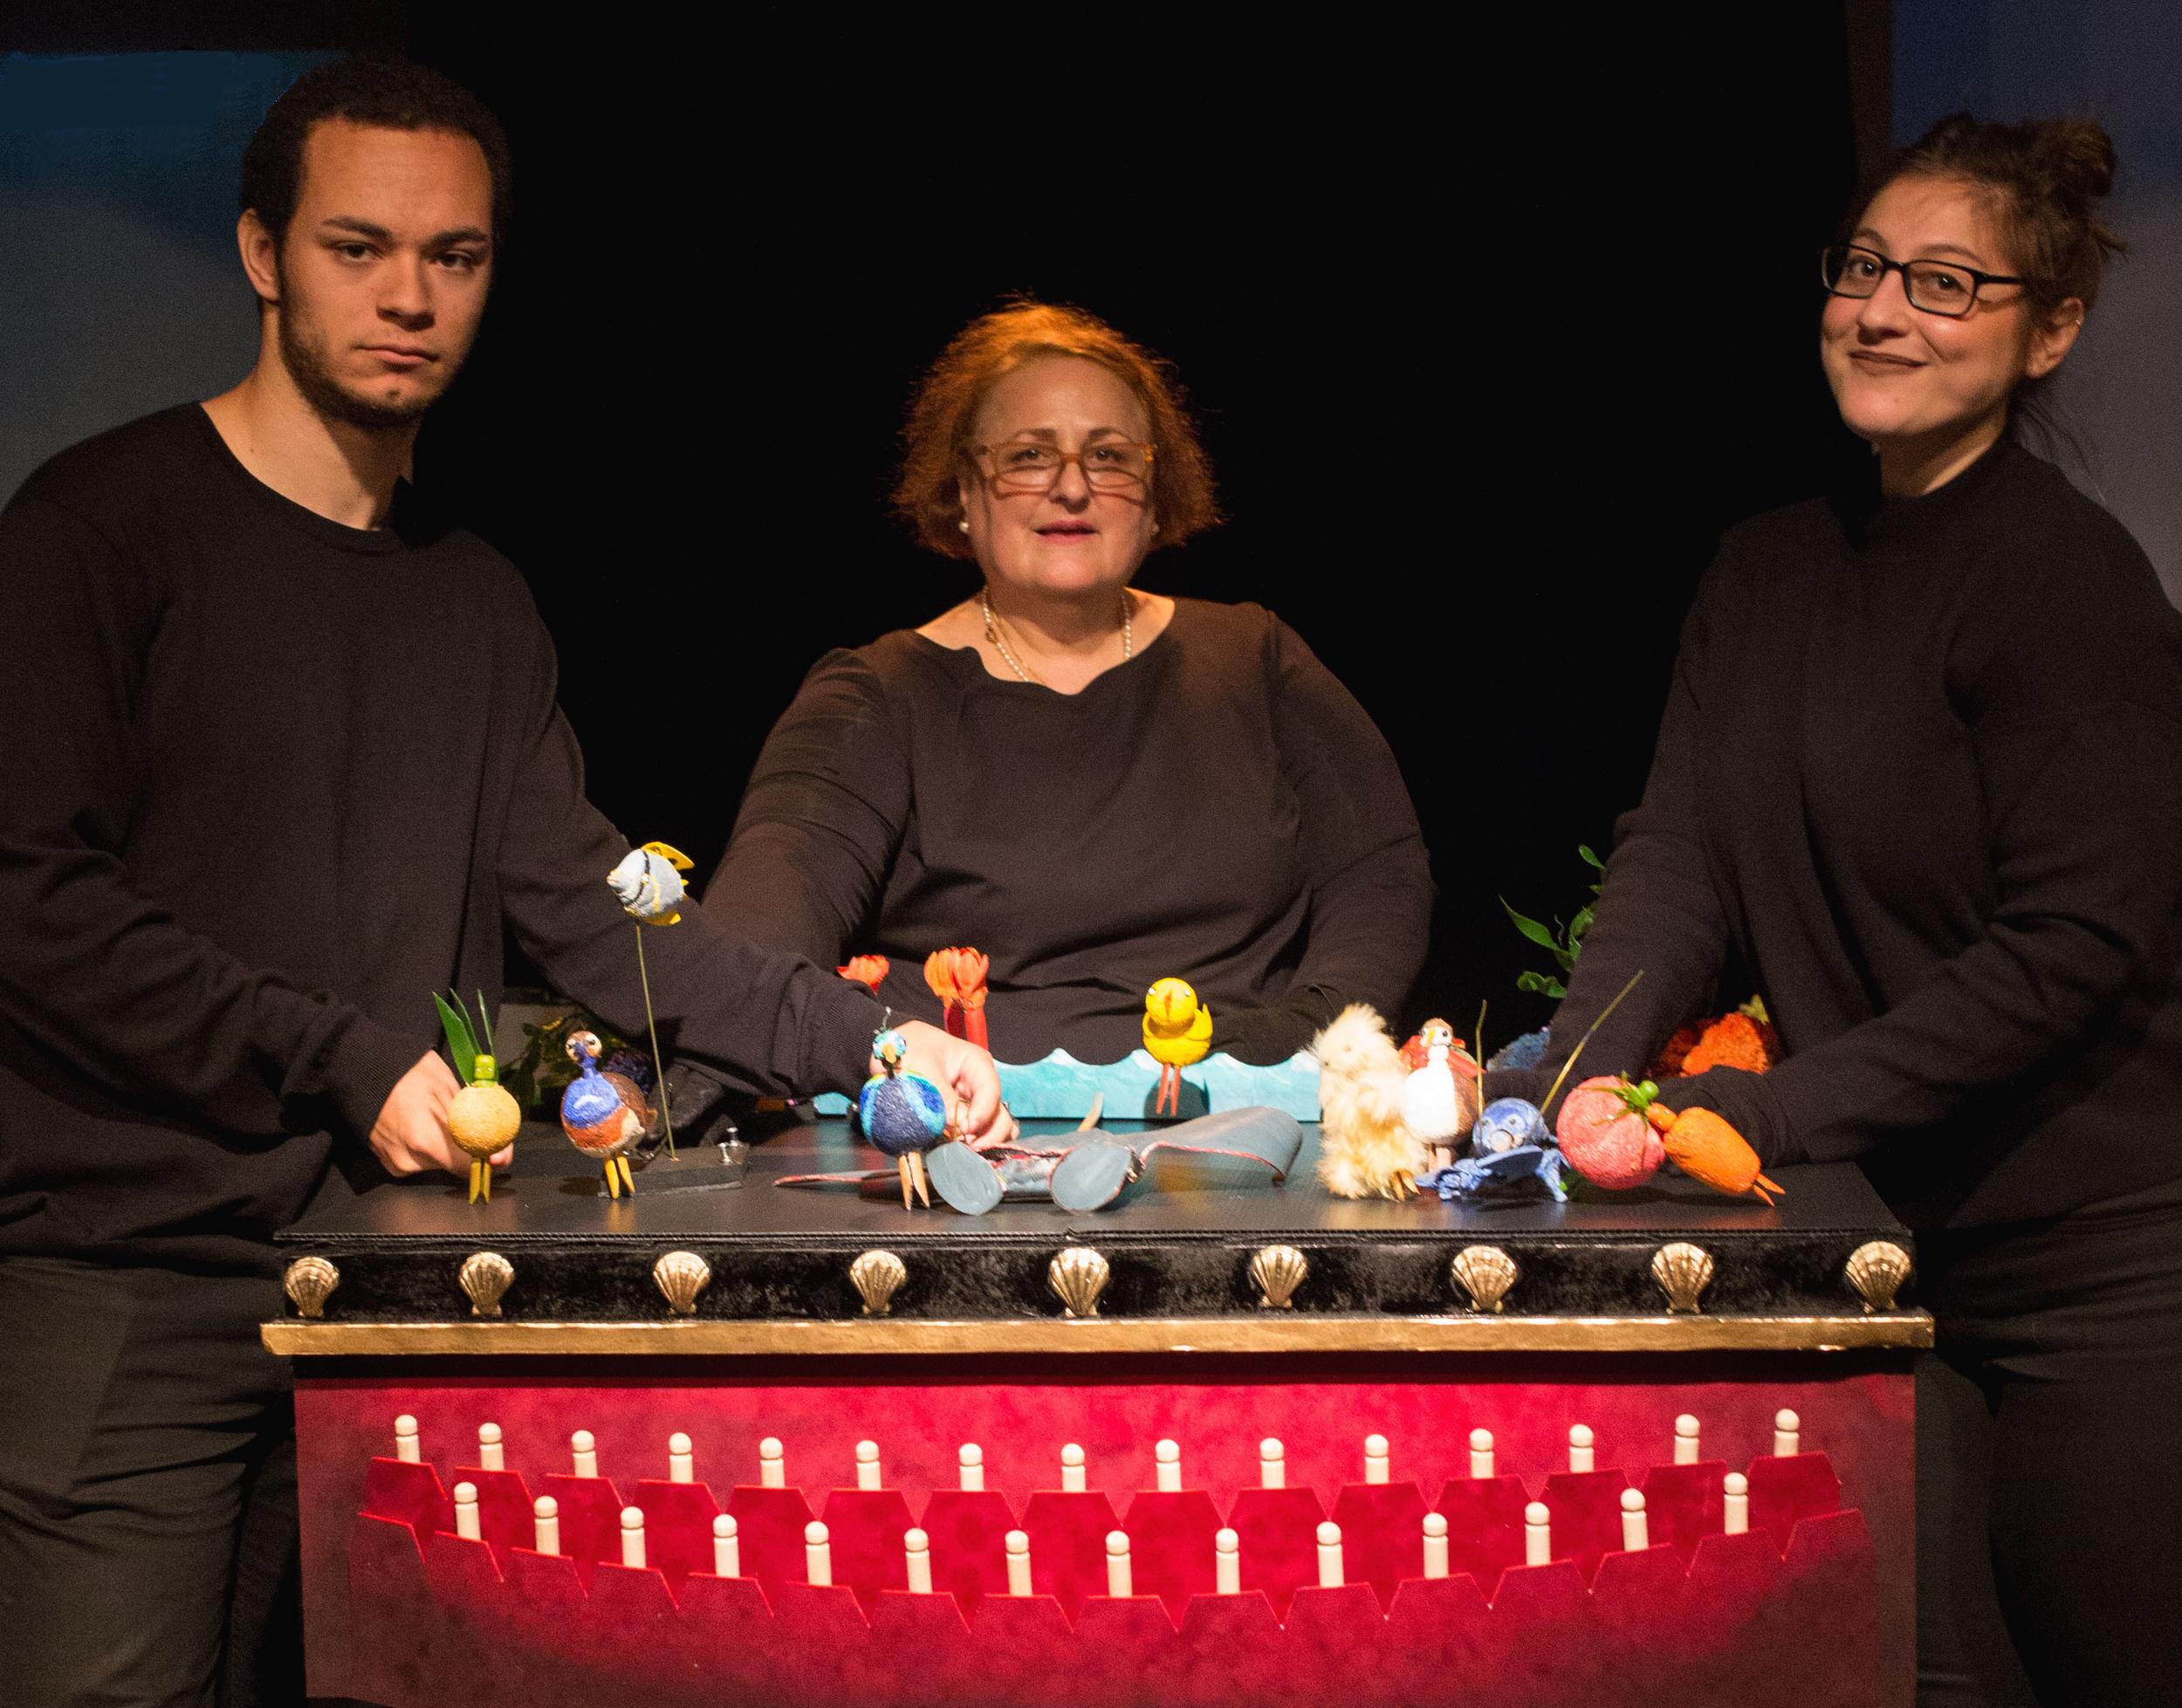 Joshua Nasser, Susan J. Vitucci and Yael Rizowy in SMALL FISH, May 2016  Photo: Max Gordon